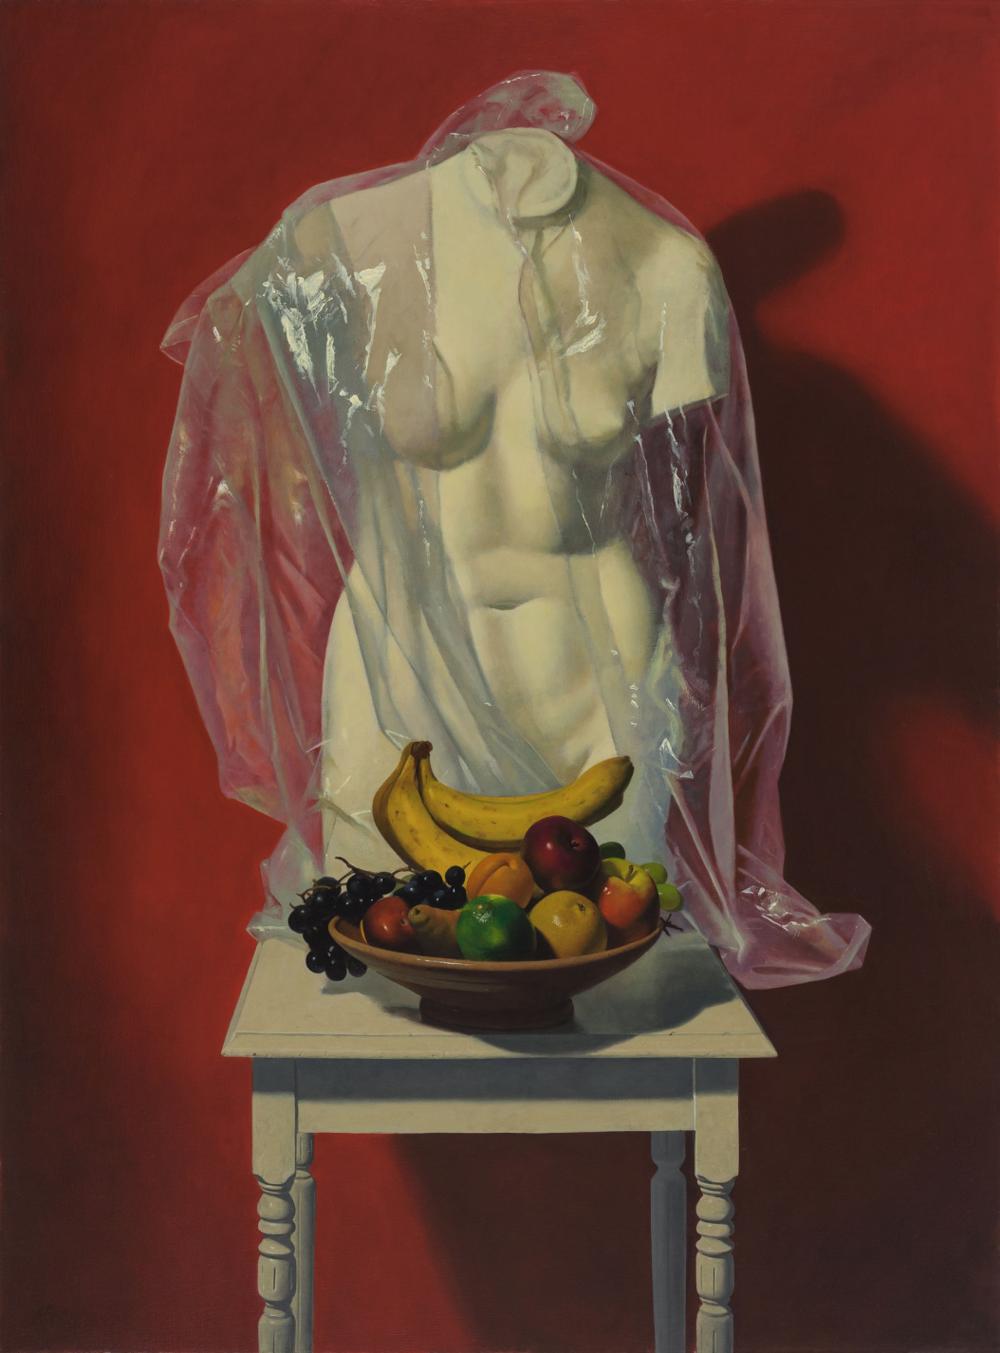 Ron Monsma, Specter  Oil on Canvas, 46x34 in.